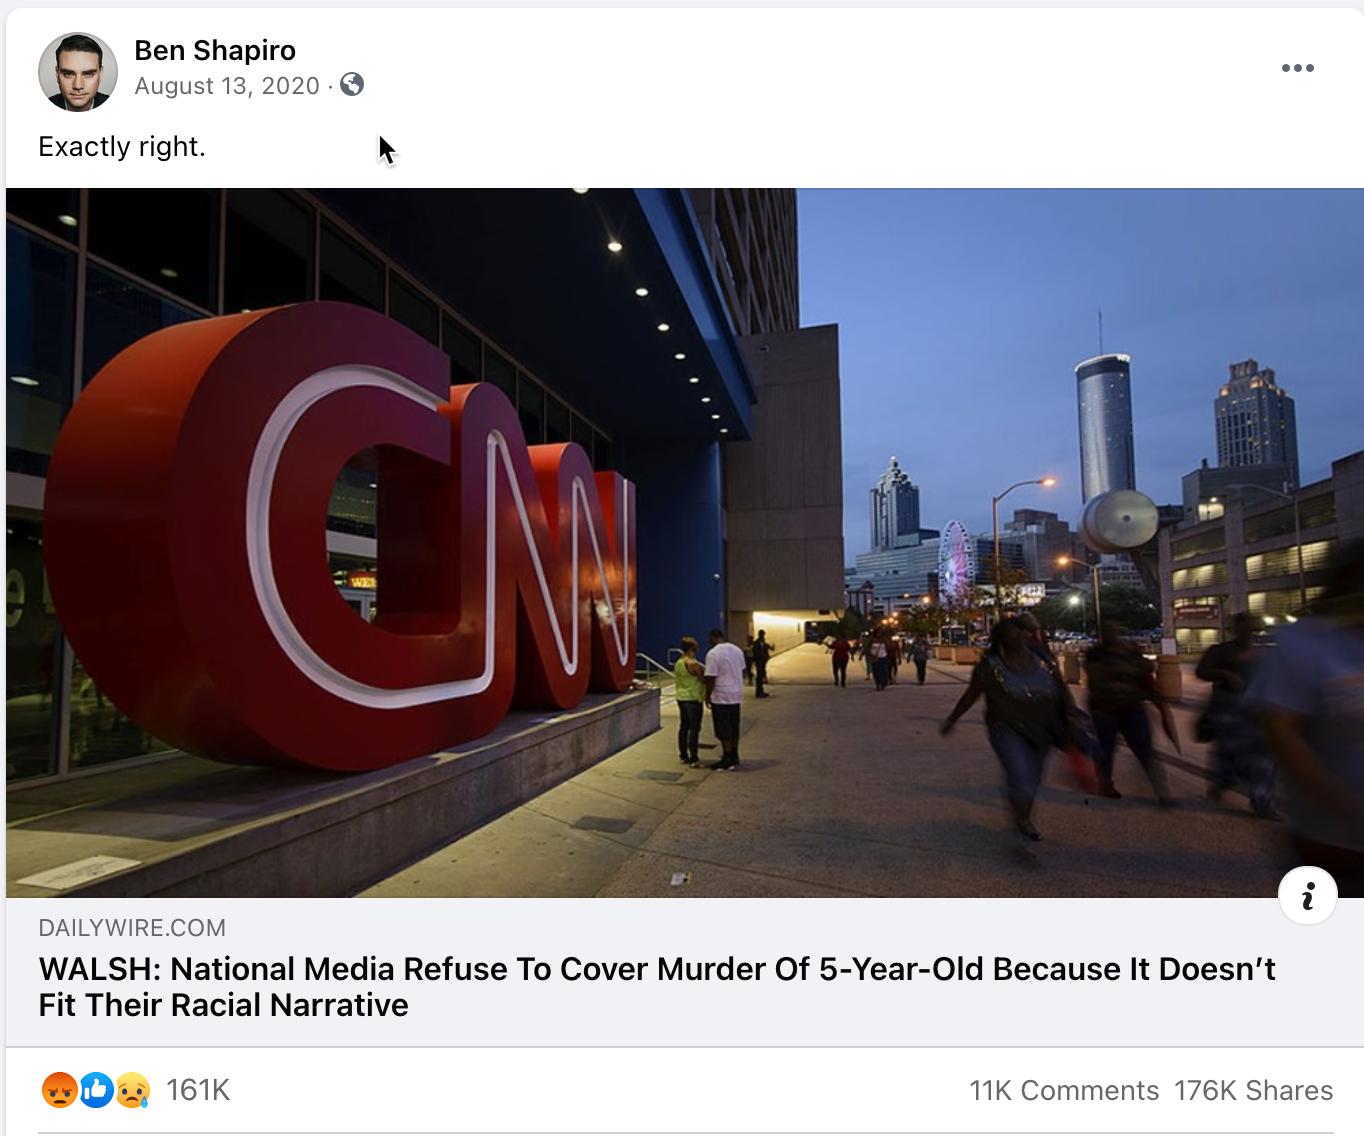 Ben Shapiro_facebook post_20200813